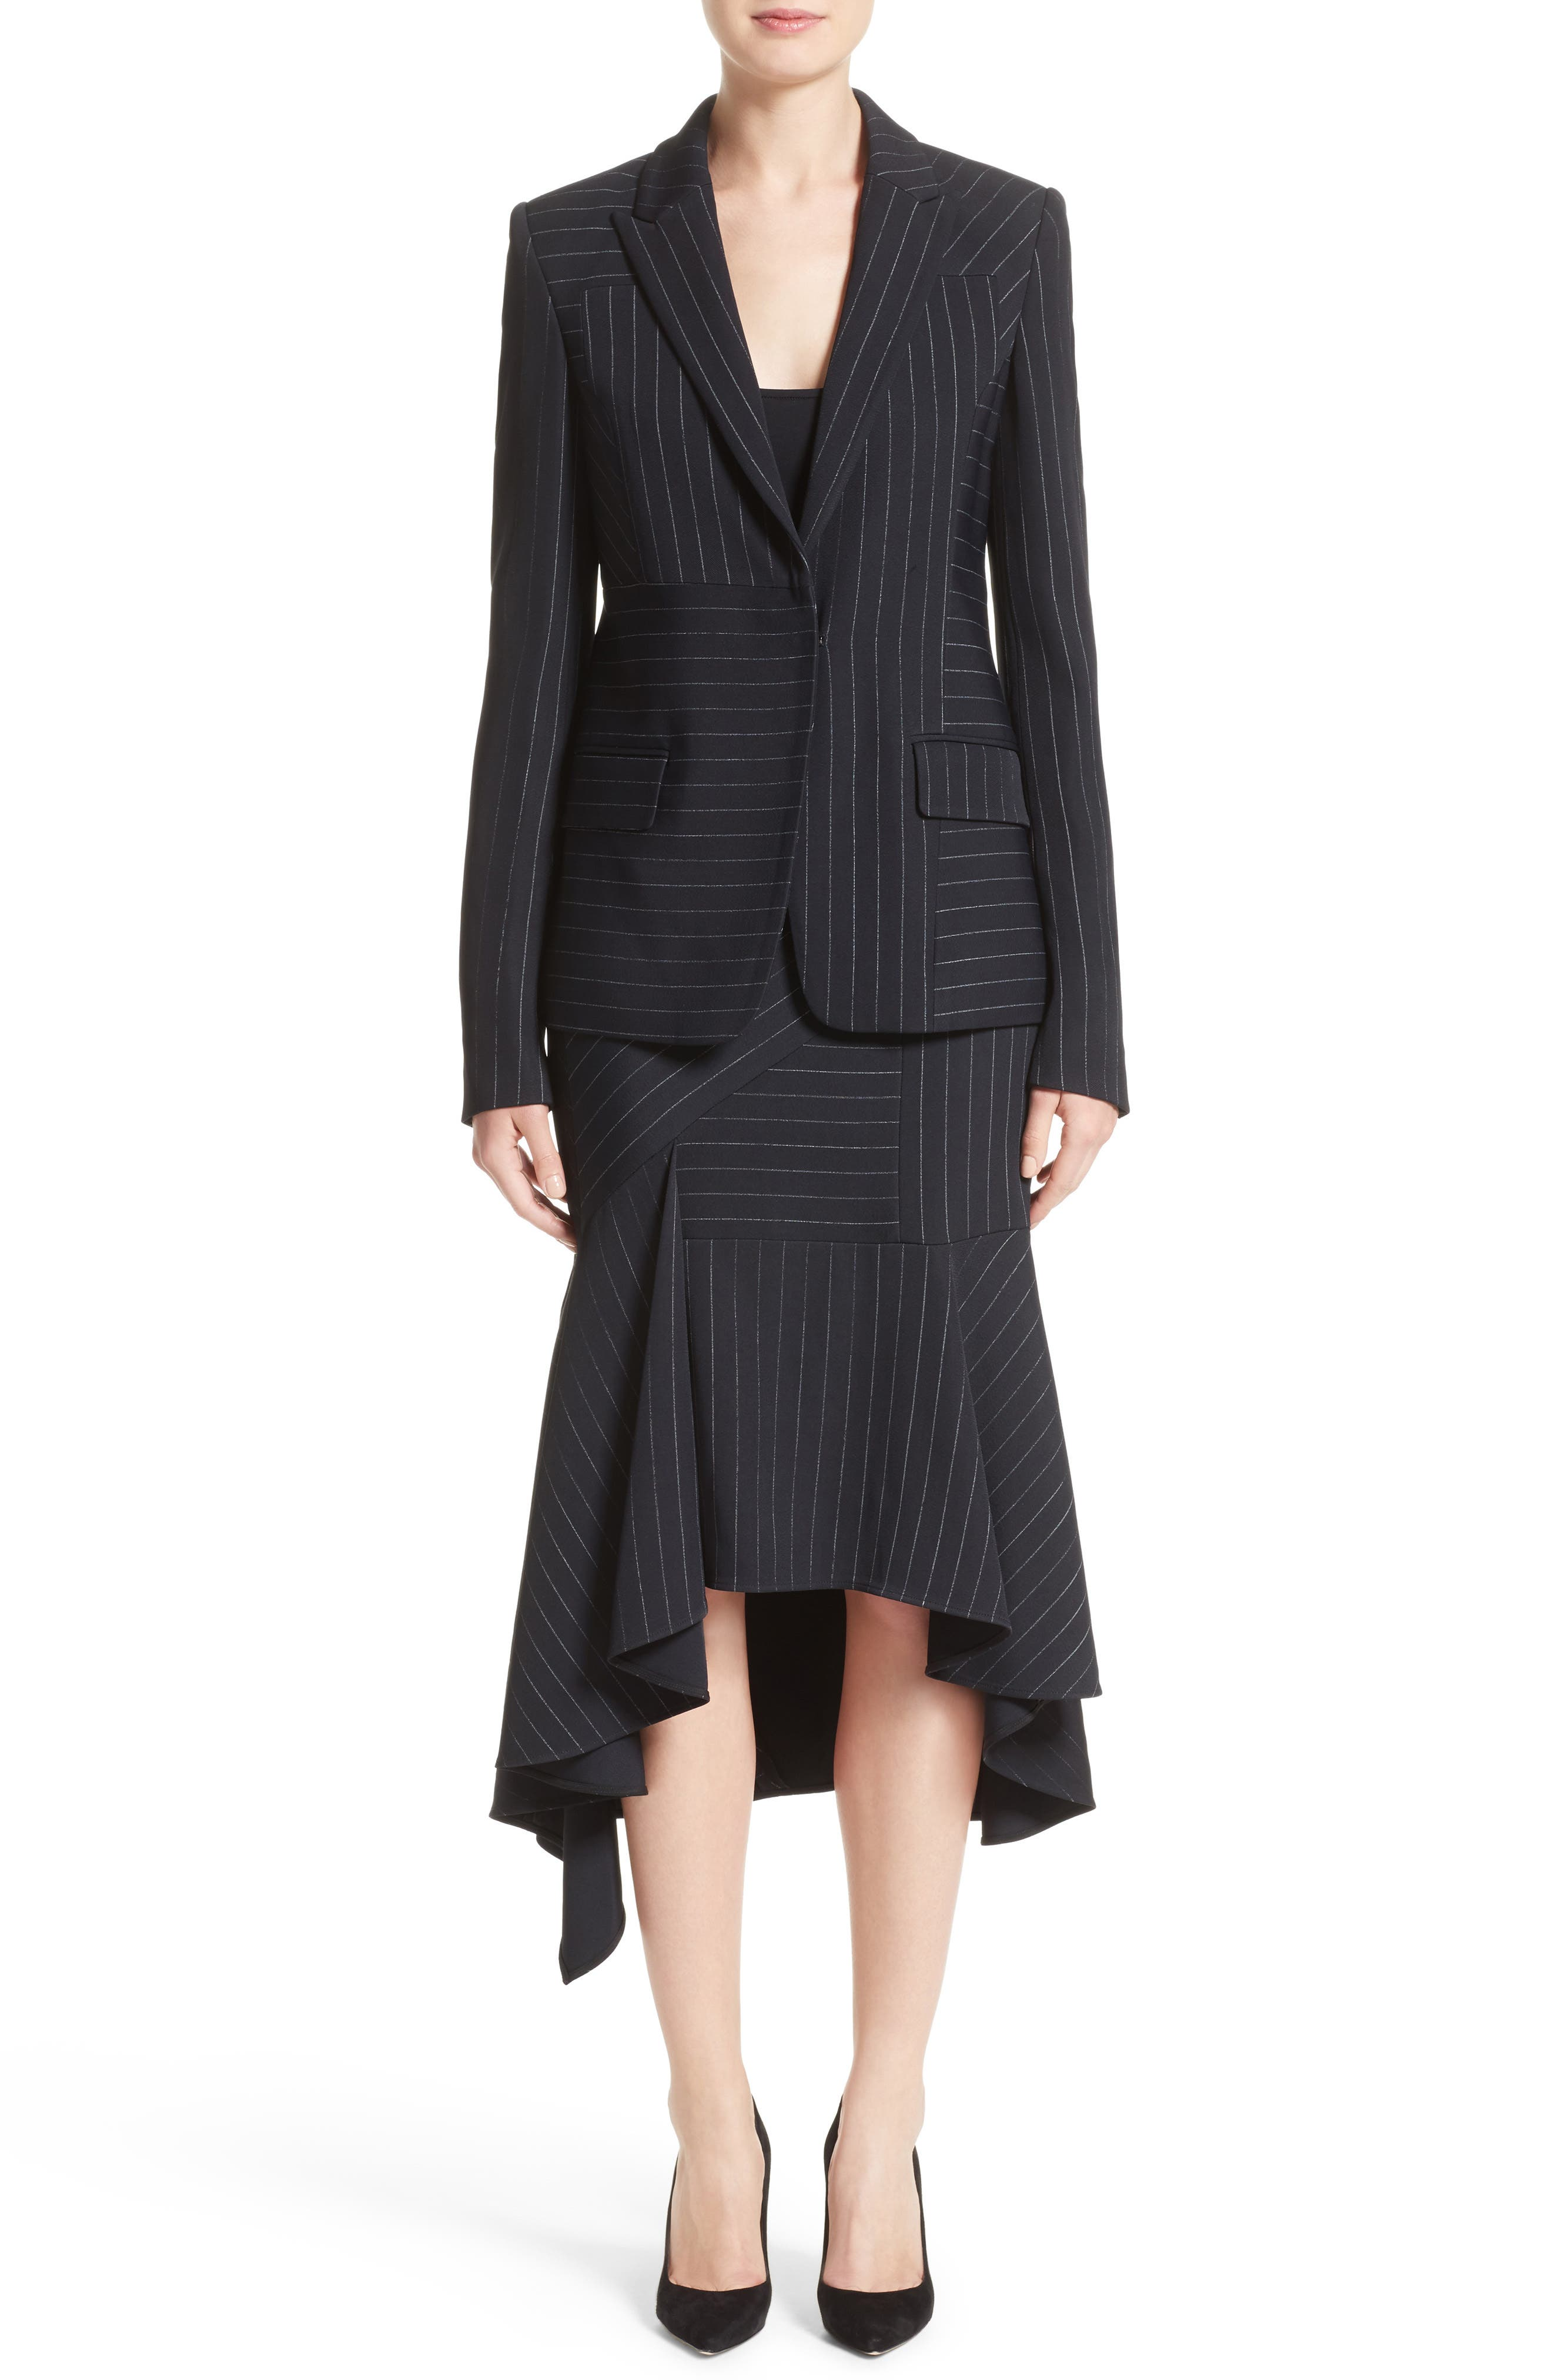 Pinstripe Stretch Asymmetrical Skirt,                             Alternate thumbnail 8, color,                             Black/ Chalk